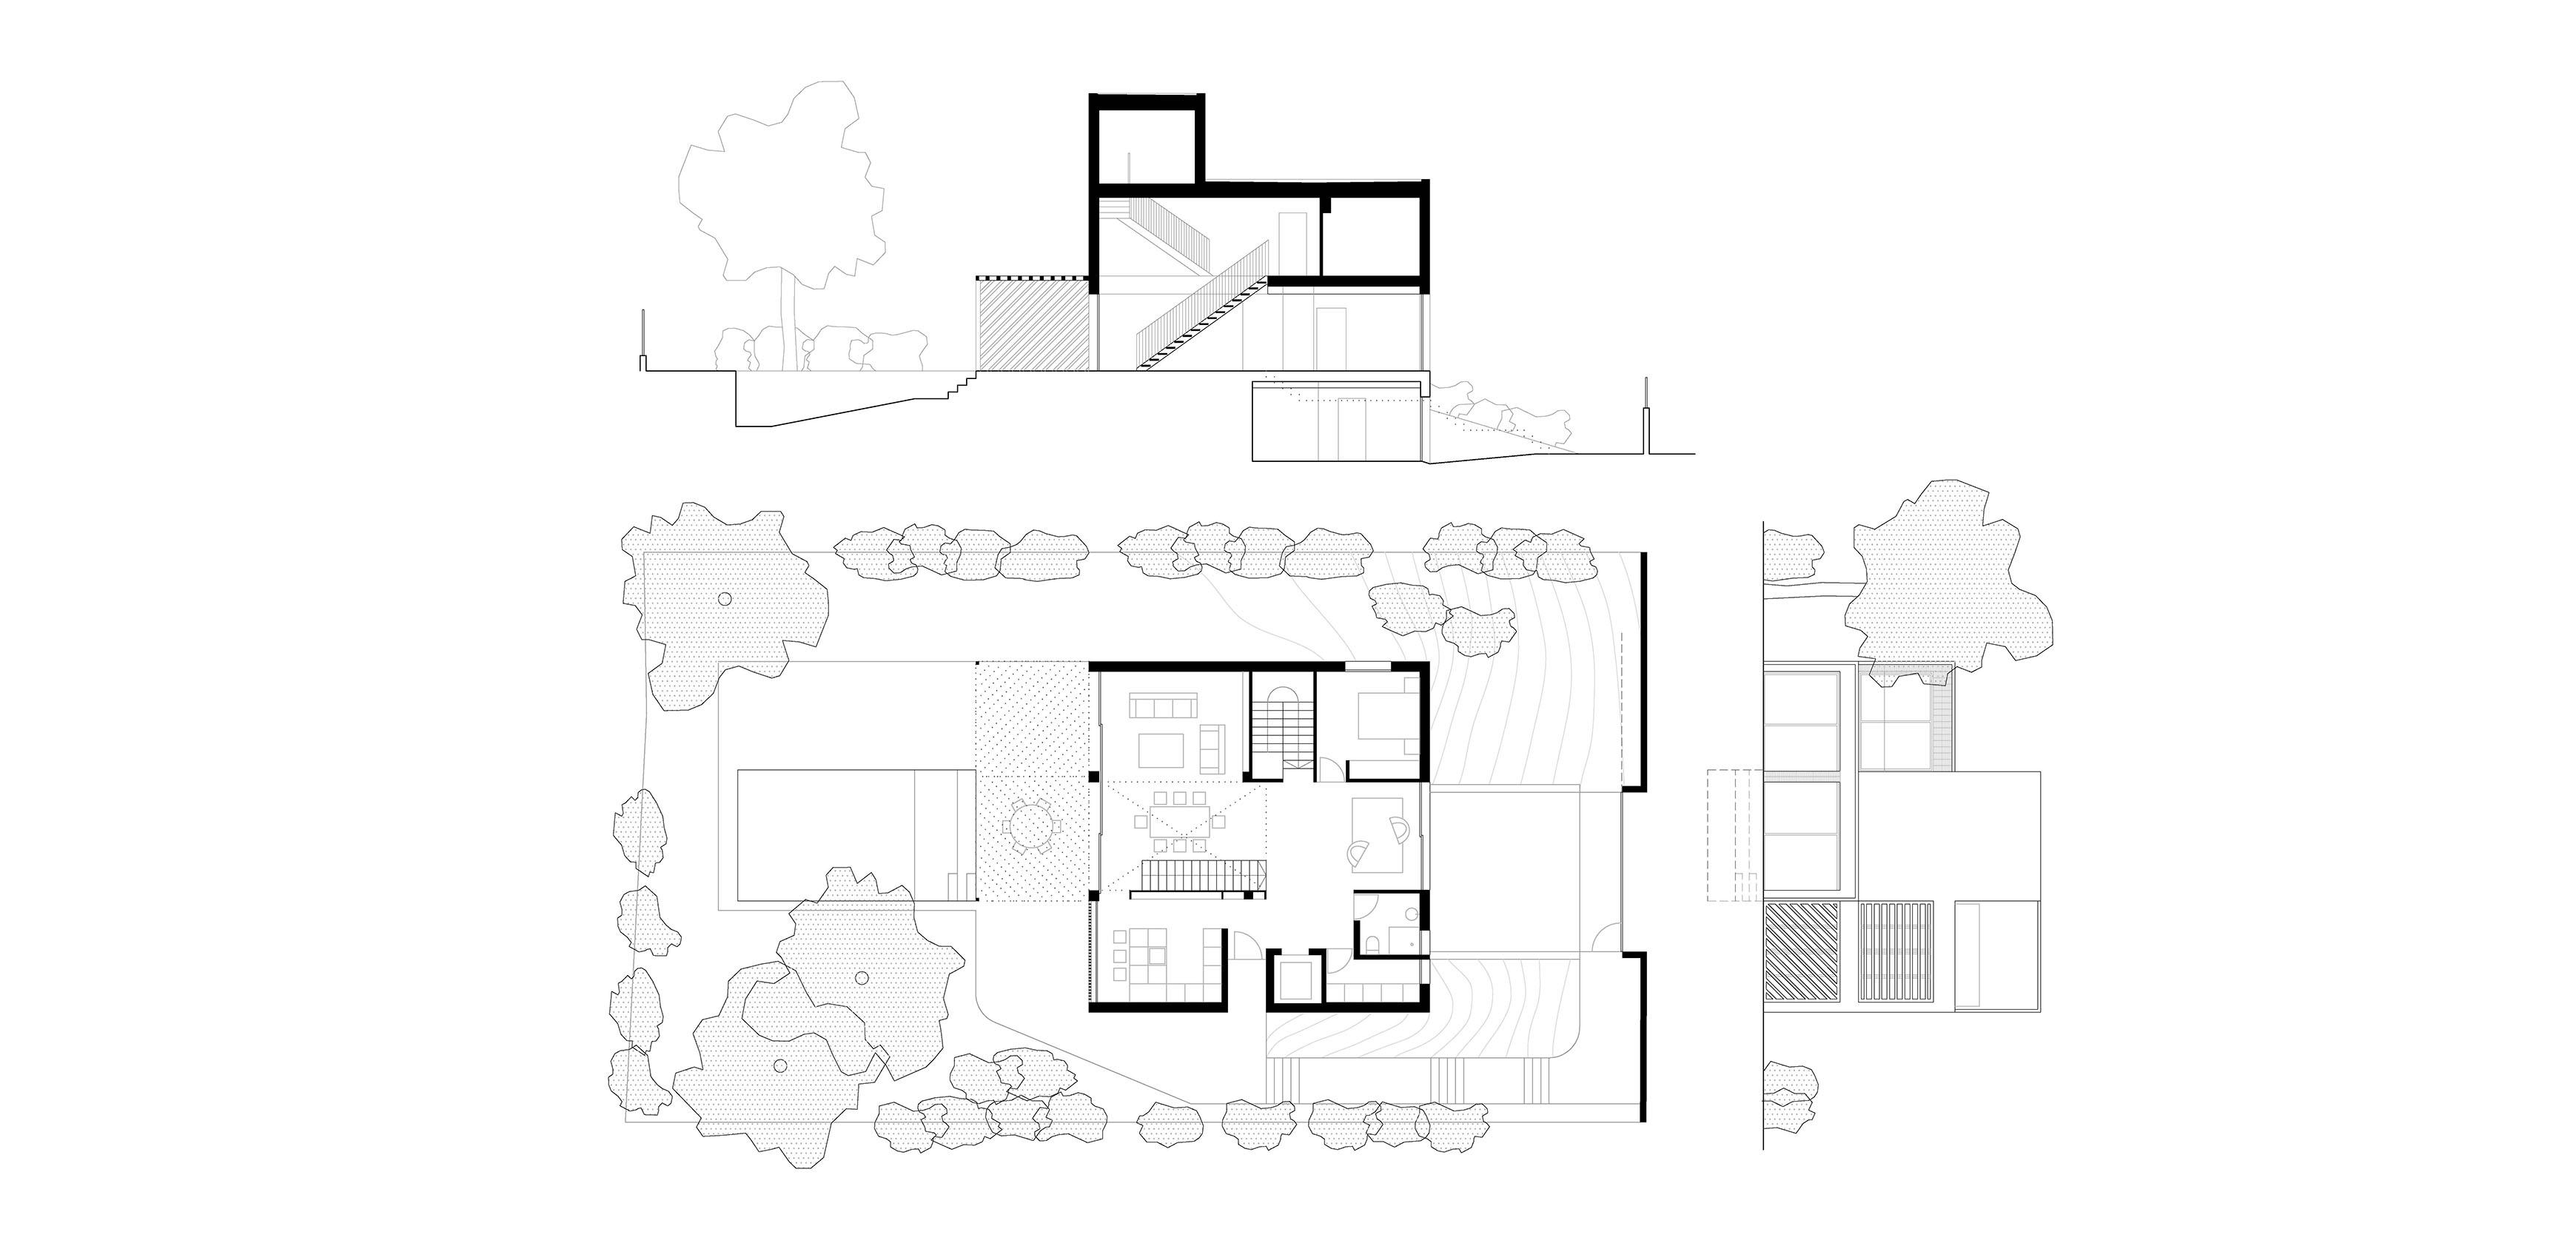 more than white HOUSE 2 - PLAYhomes - PLAYstudio